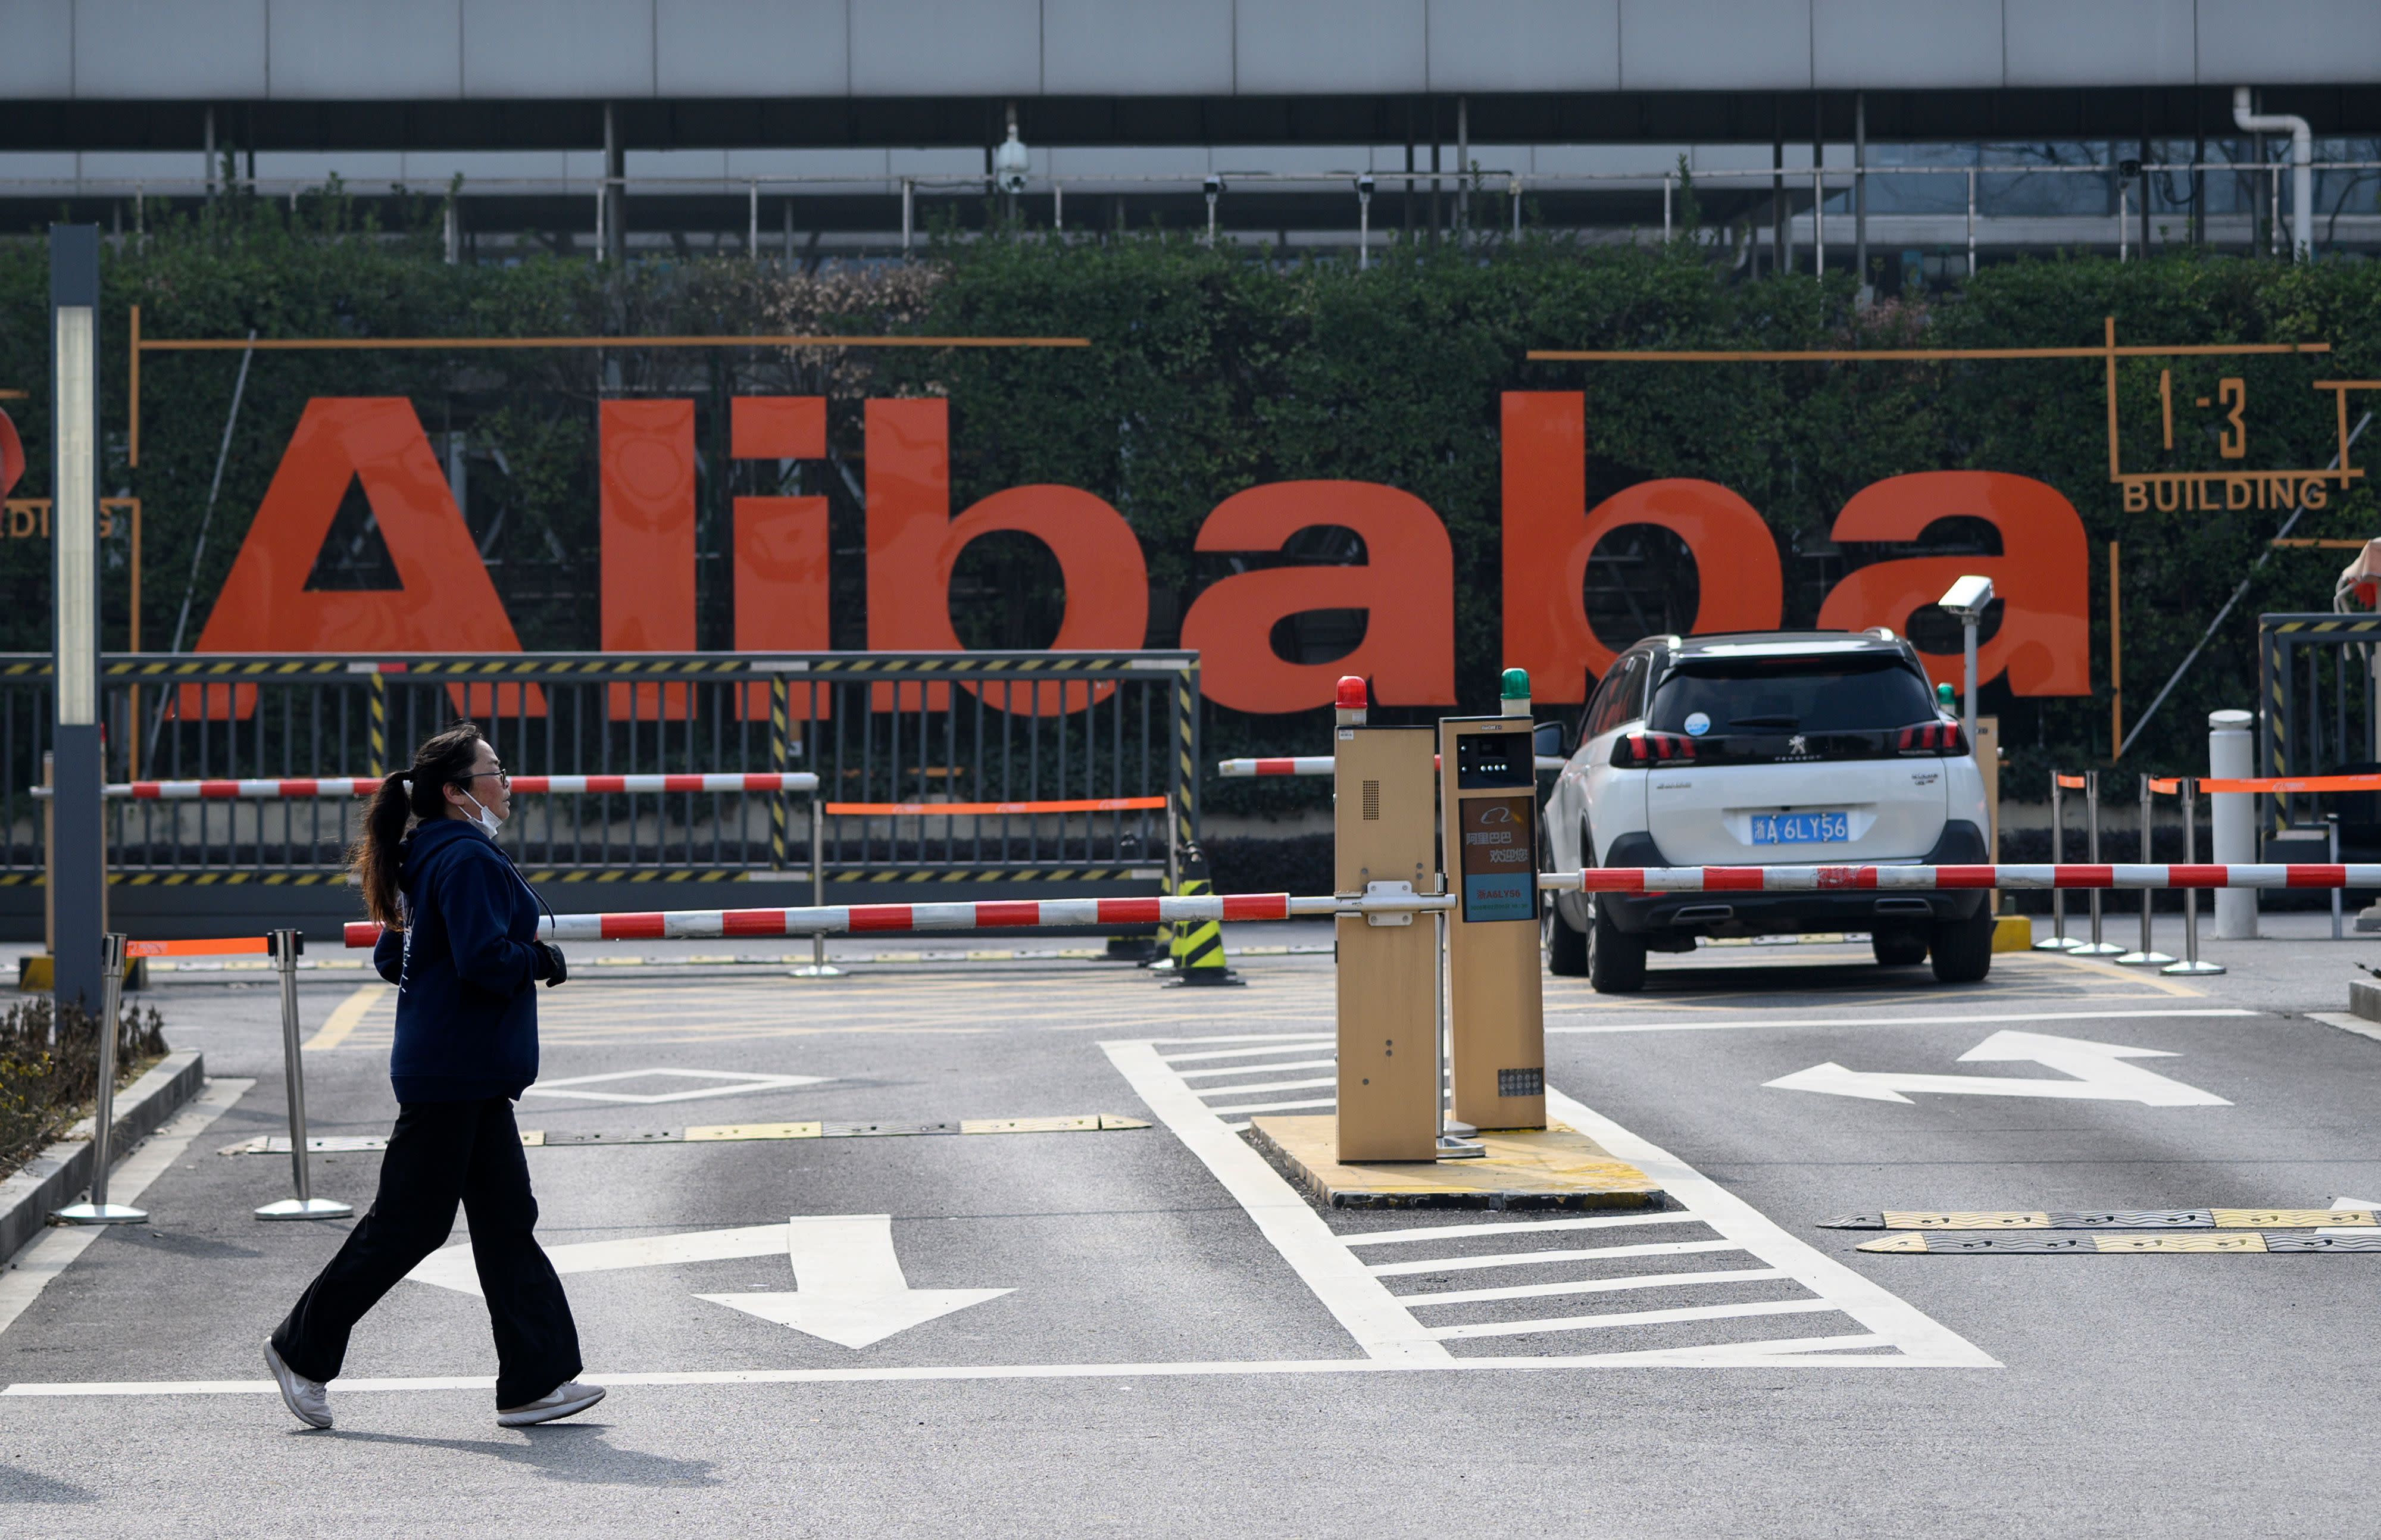 Alibaba beats earnings estimates, revenue climbs 38%